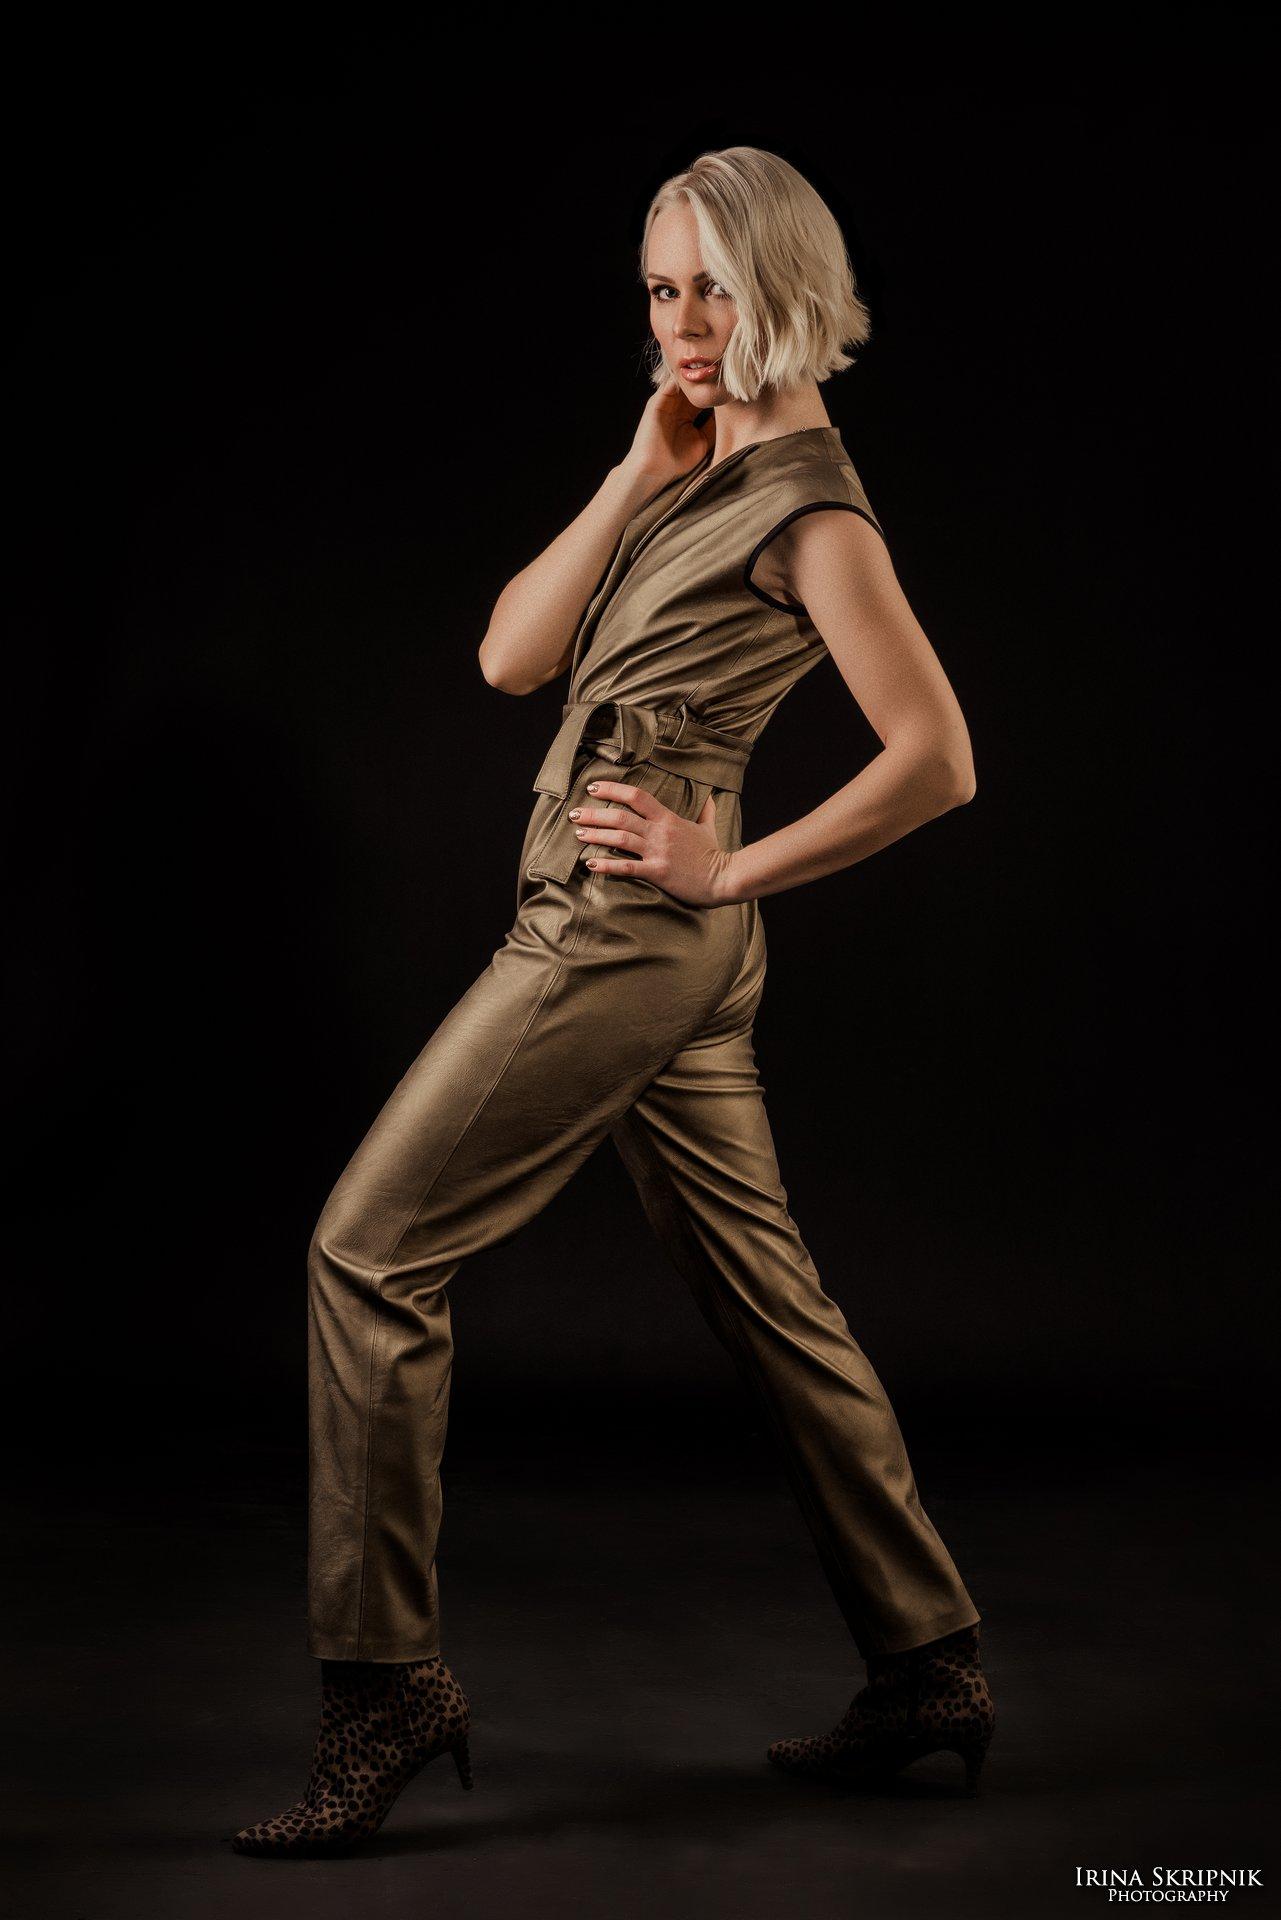 Irina Skripnik Photography 30324